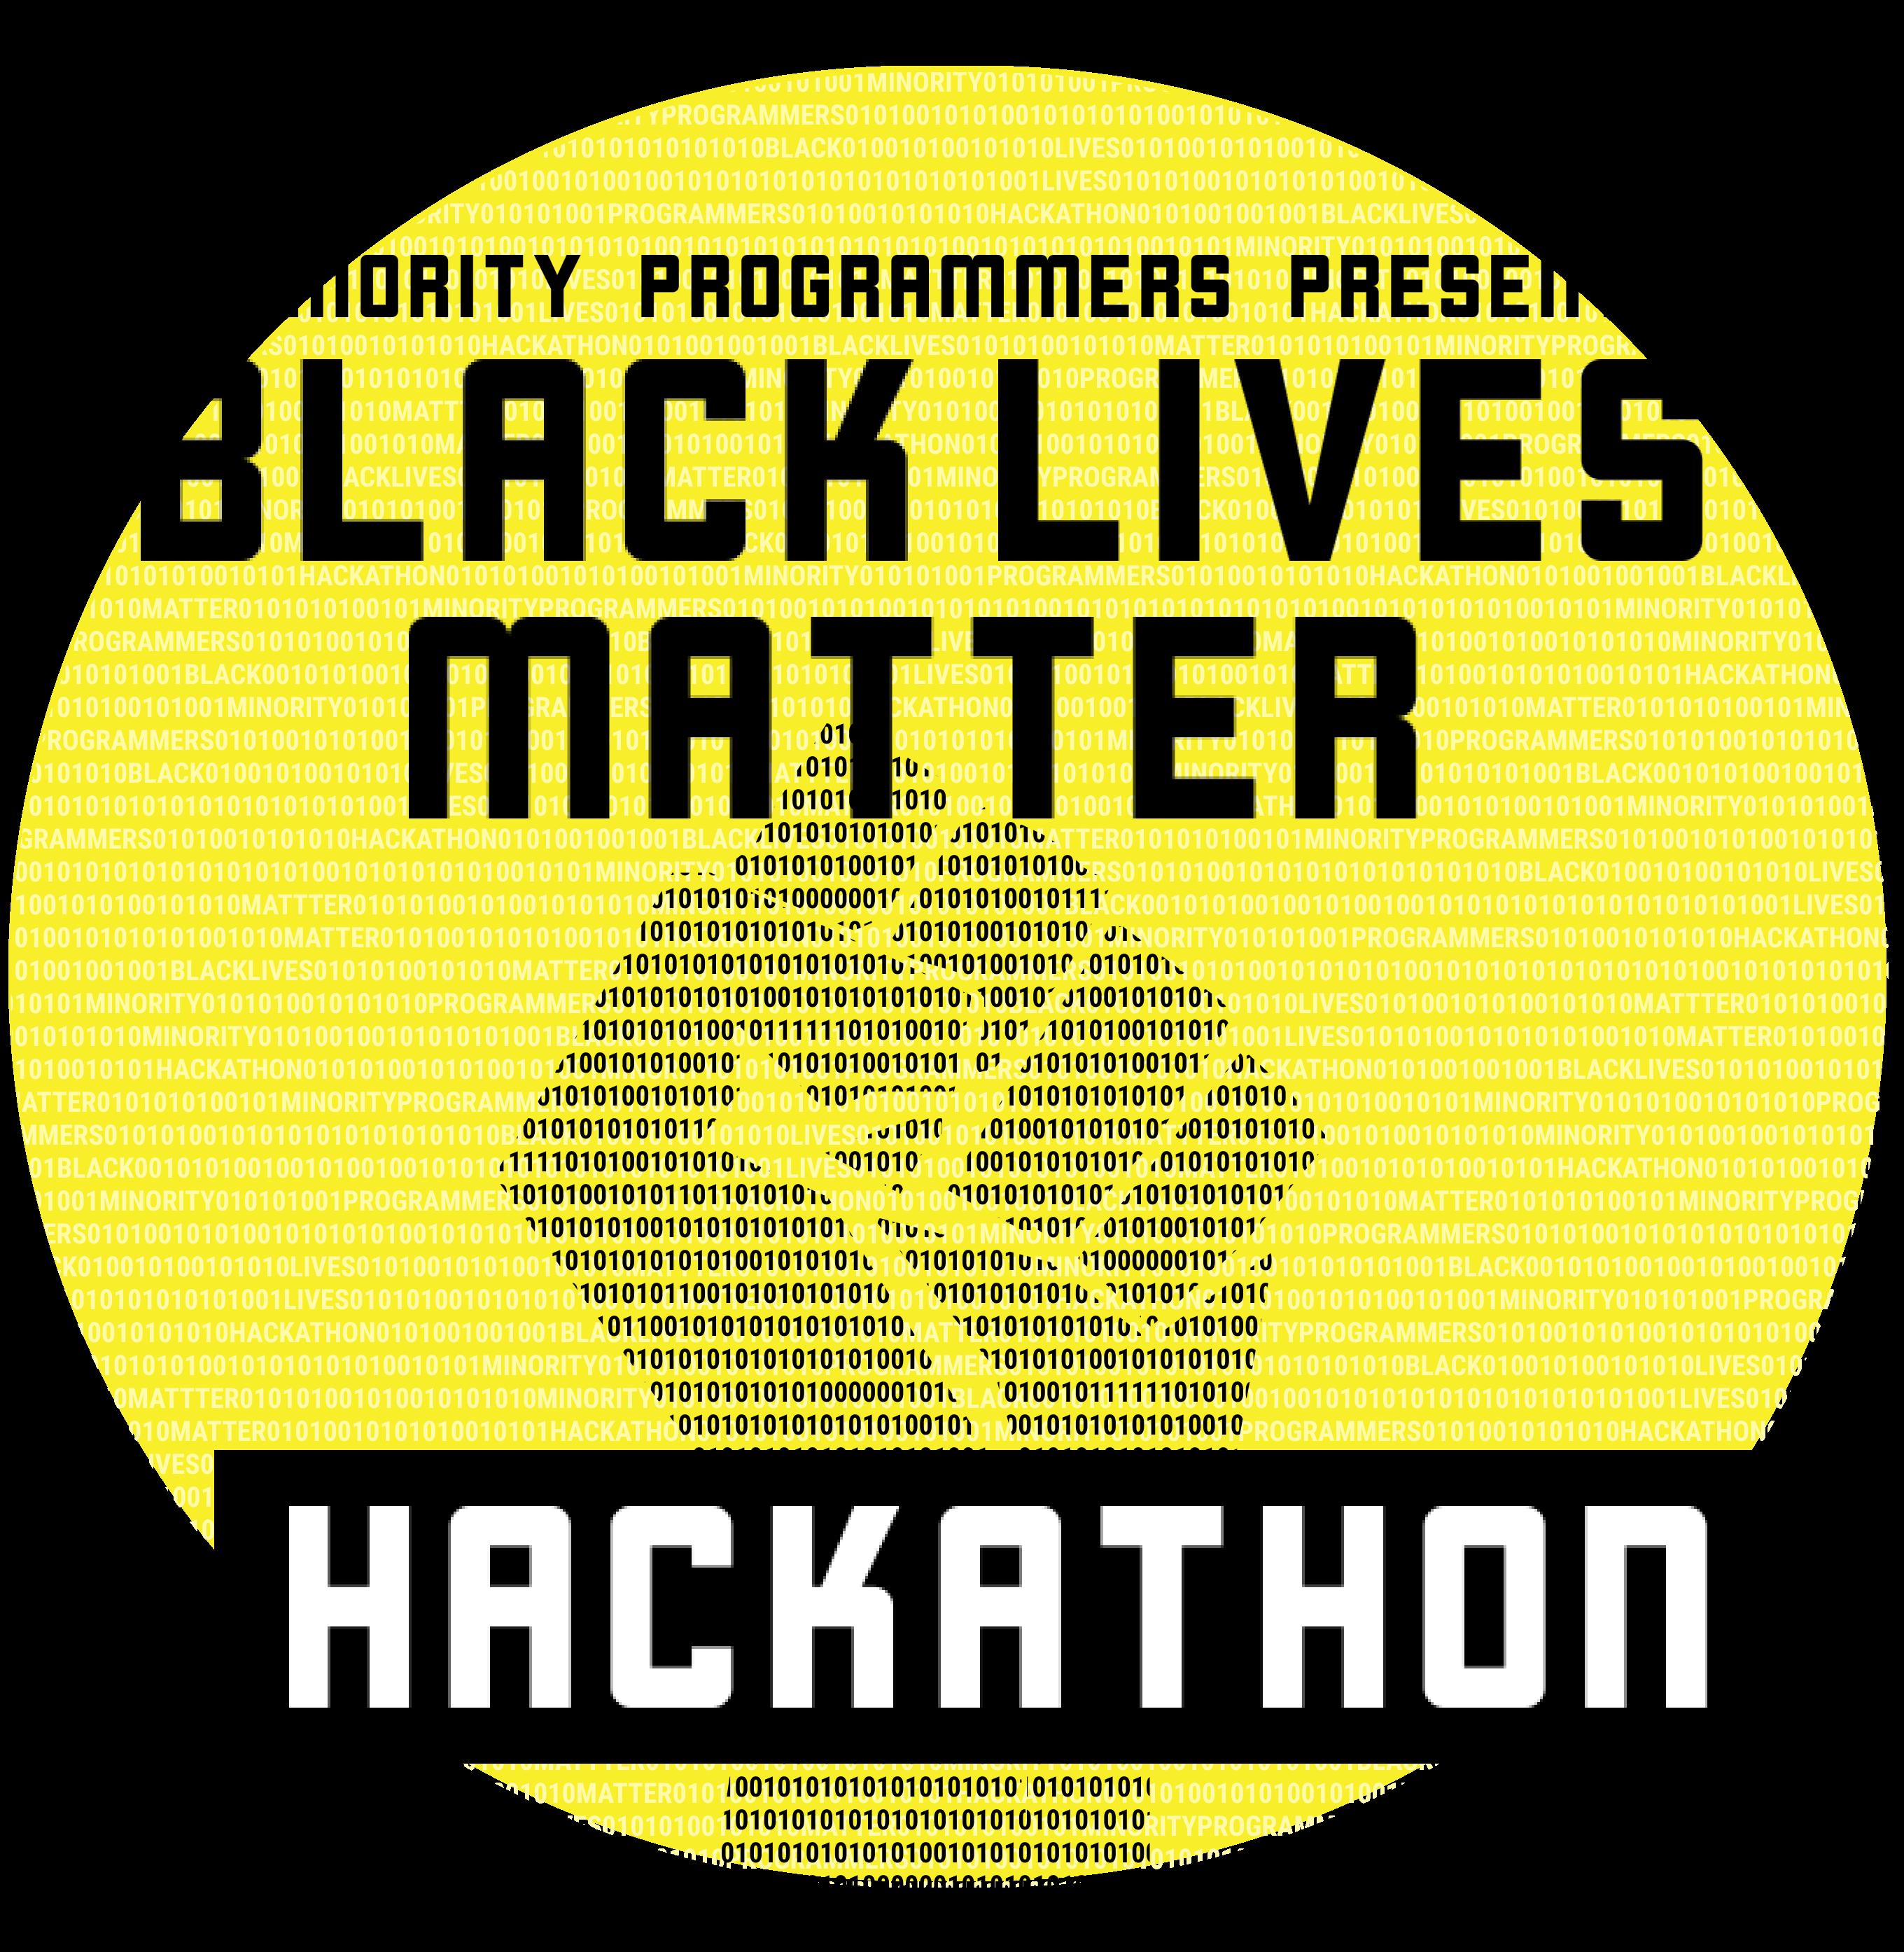 Minority Programmers Black Lives Matter Hackathon